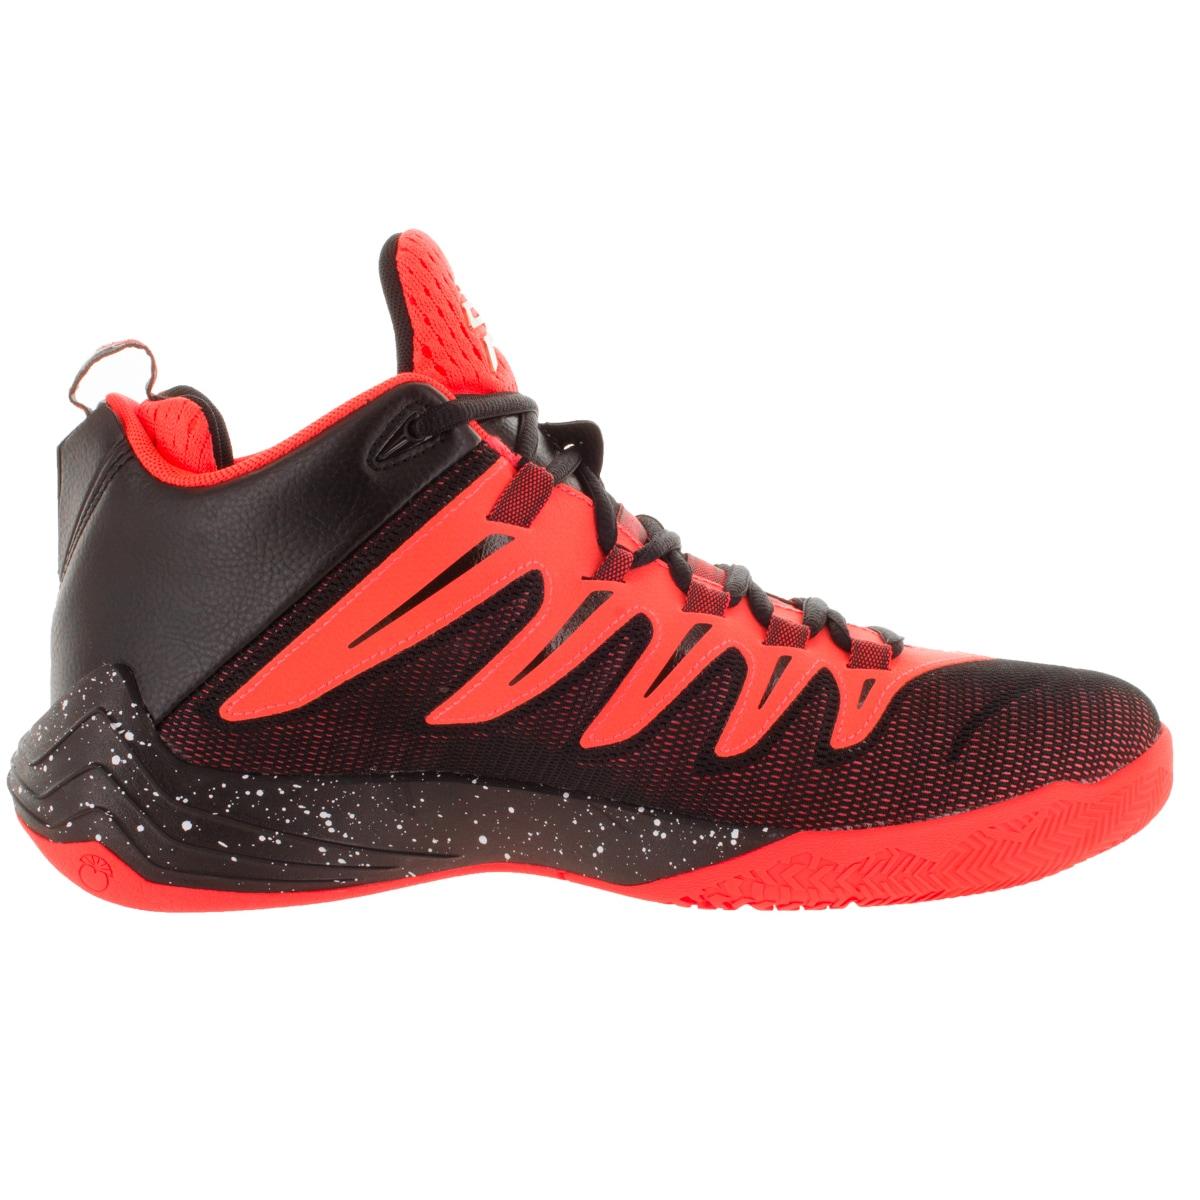 e846795412c03e Shop Nike Jordan Men s Jordan Cp3.Ix Orange  Gld Str Black Inf Basketball  Shoe - Free Shipping Today - Overstock - 12318254